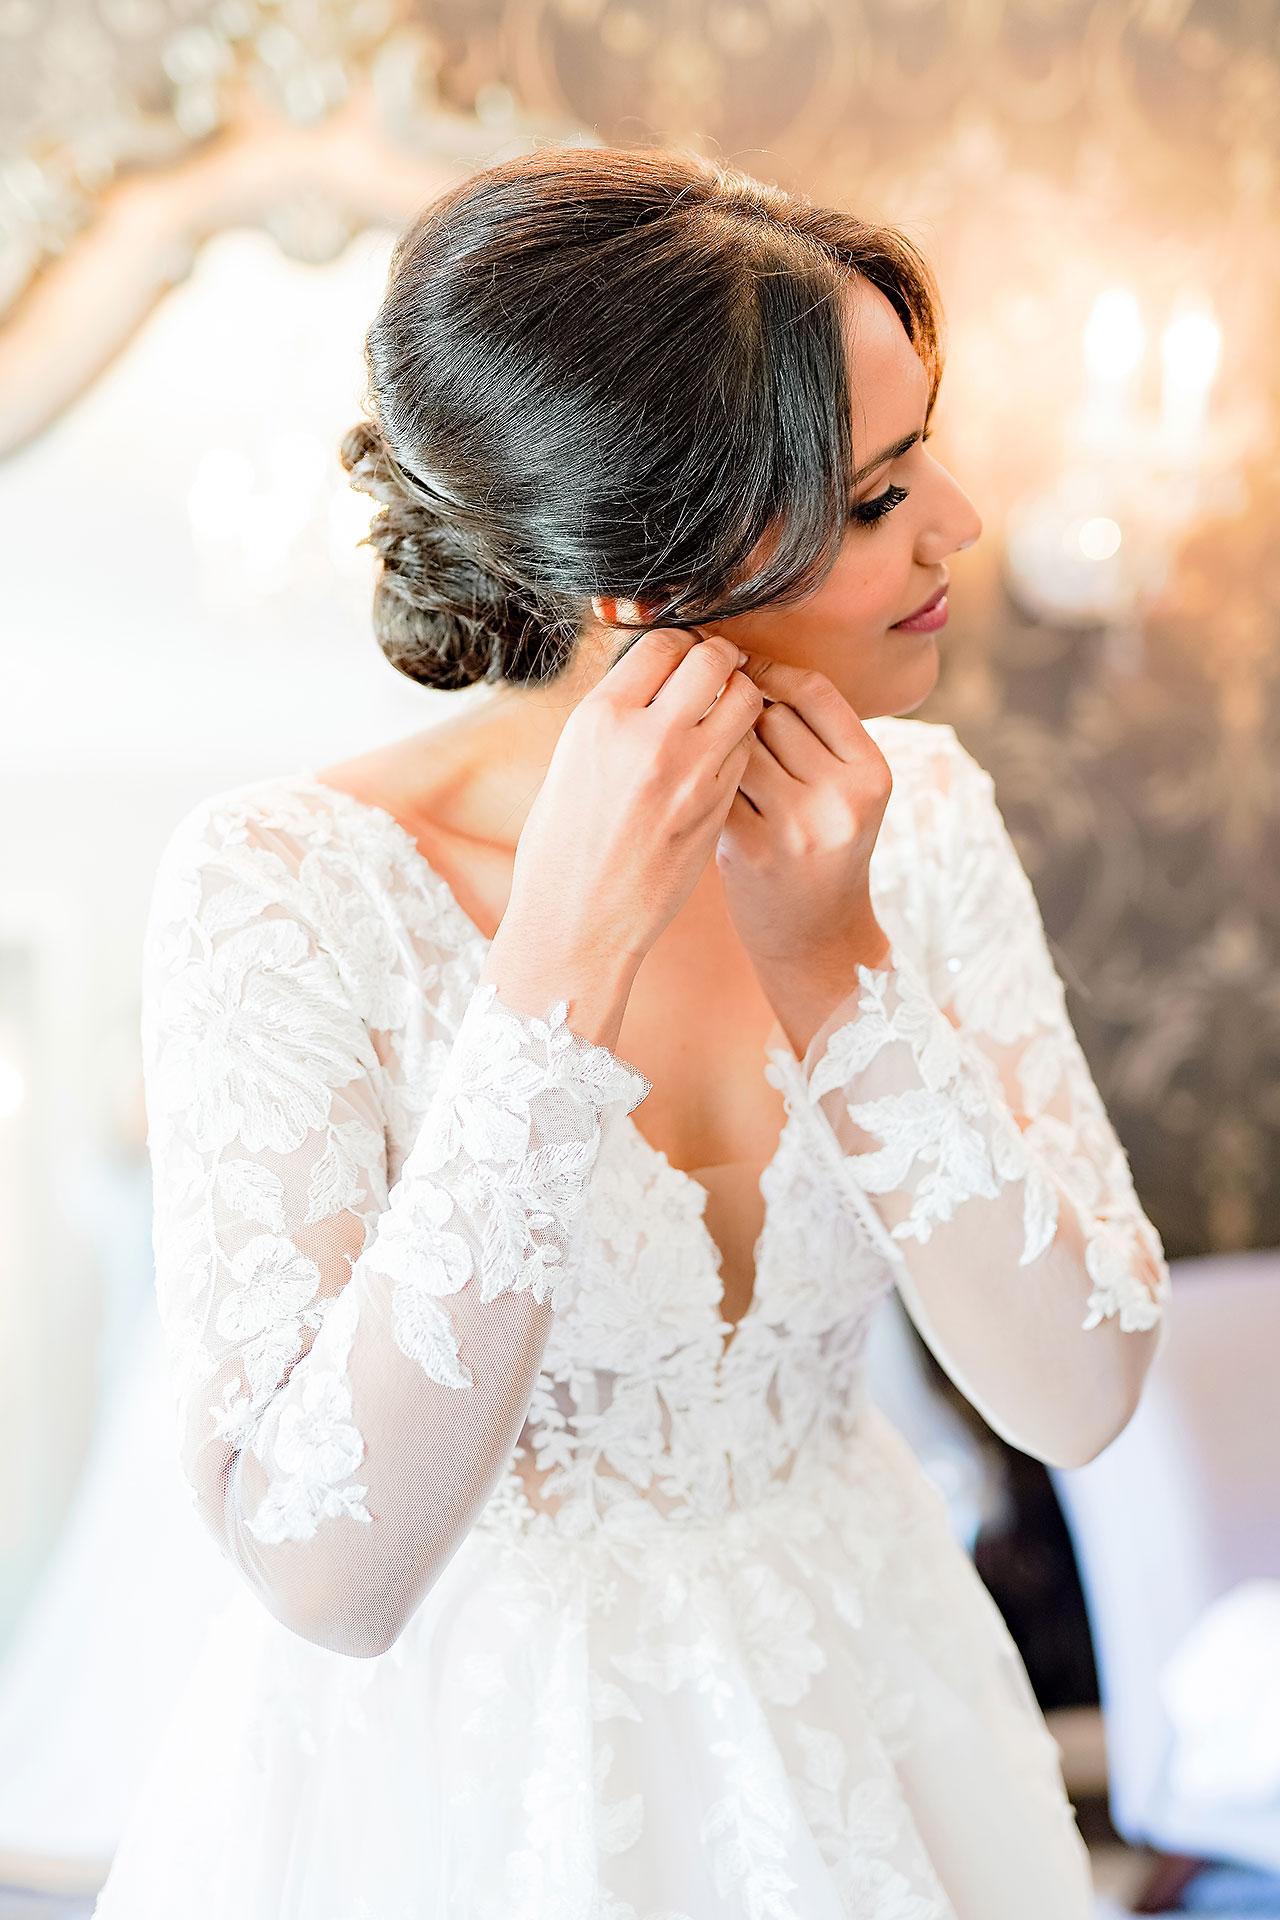 Nadia Parker Black Iris Estate Carmel Indiana Wedding May 2021 031